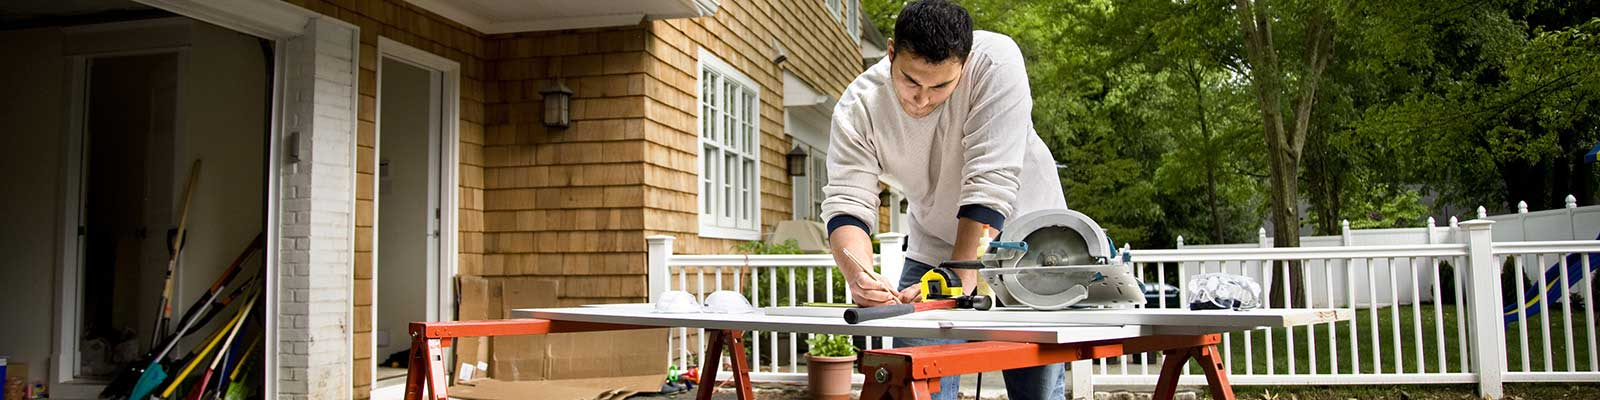 Equipment Rentals - Kimball Building Supplies Centre